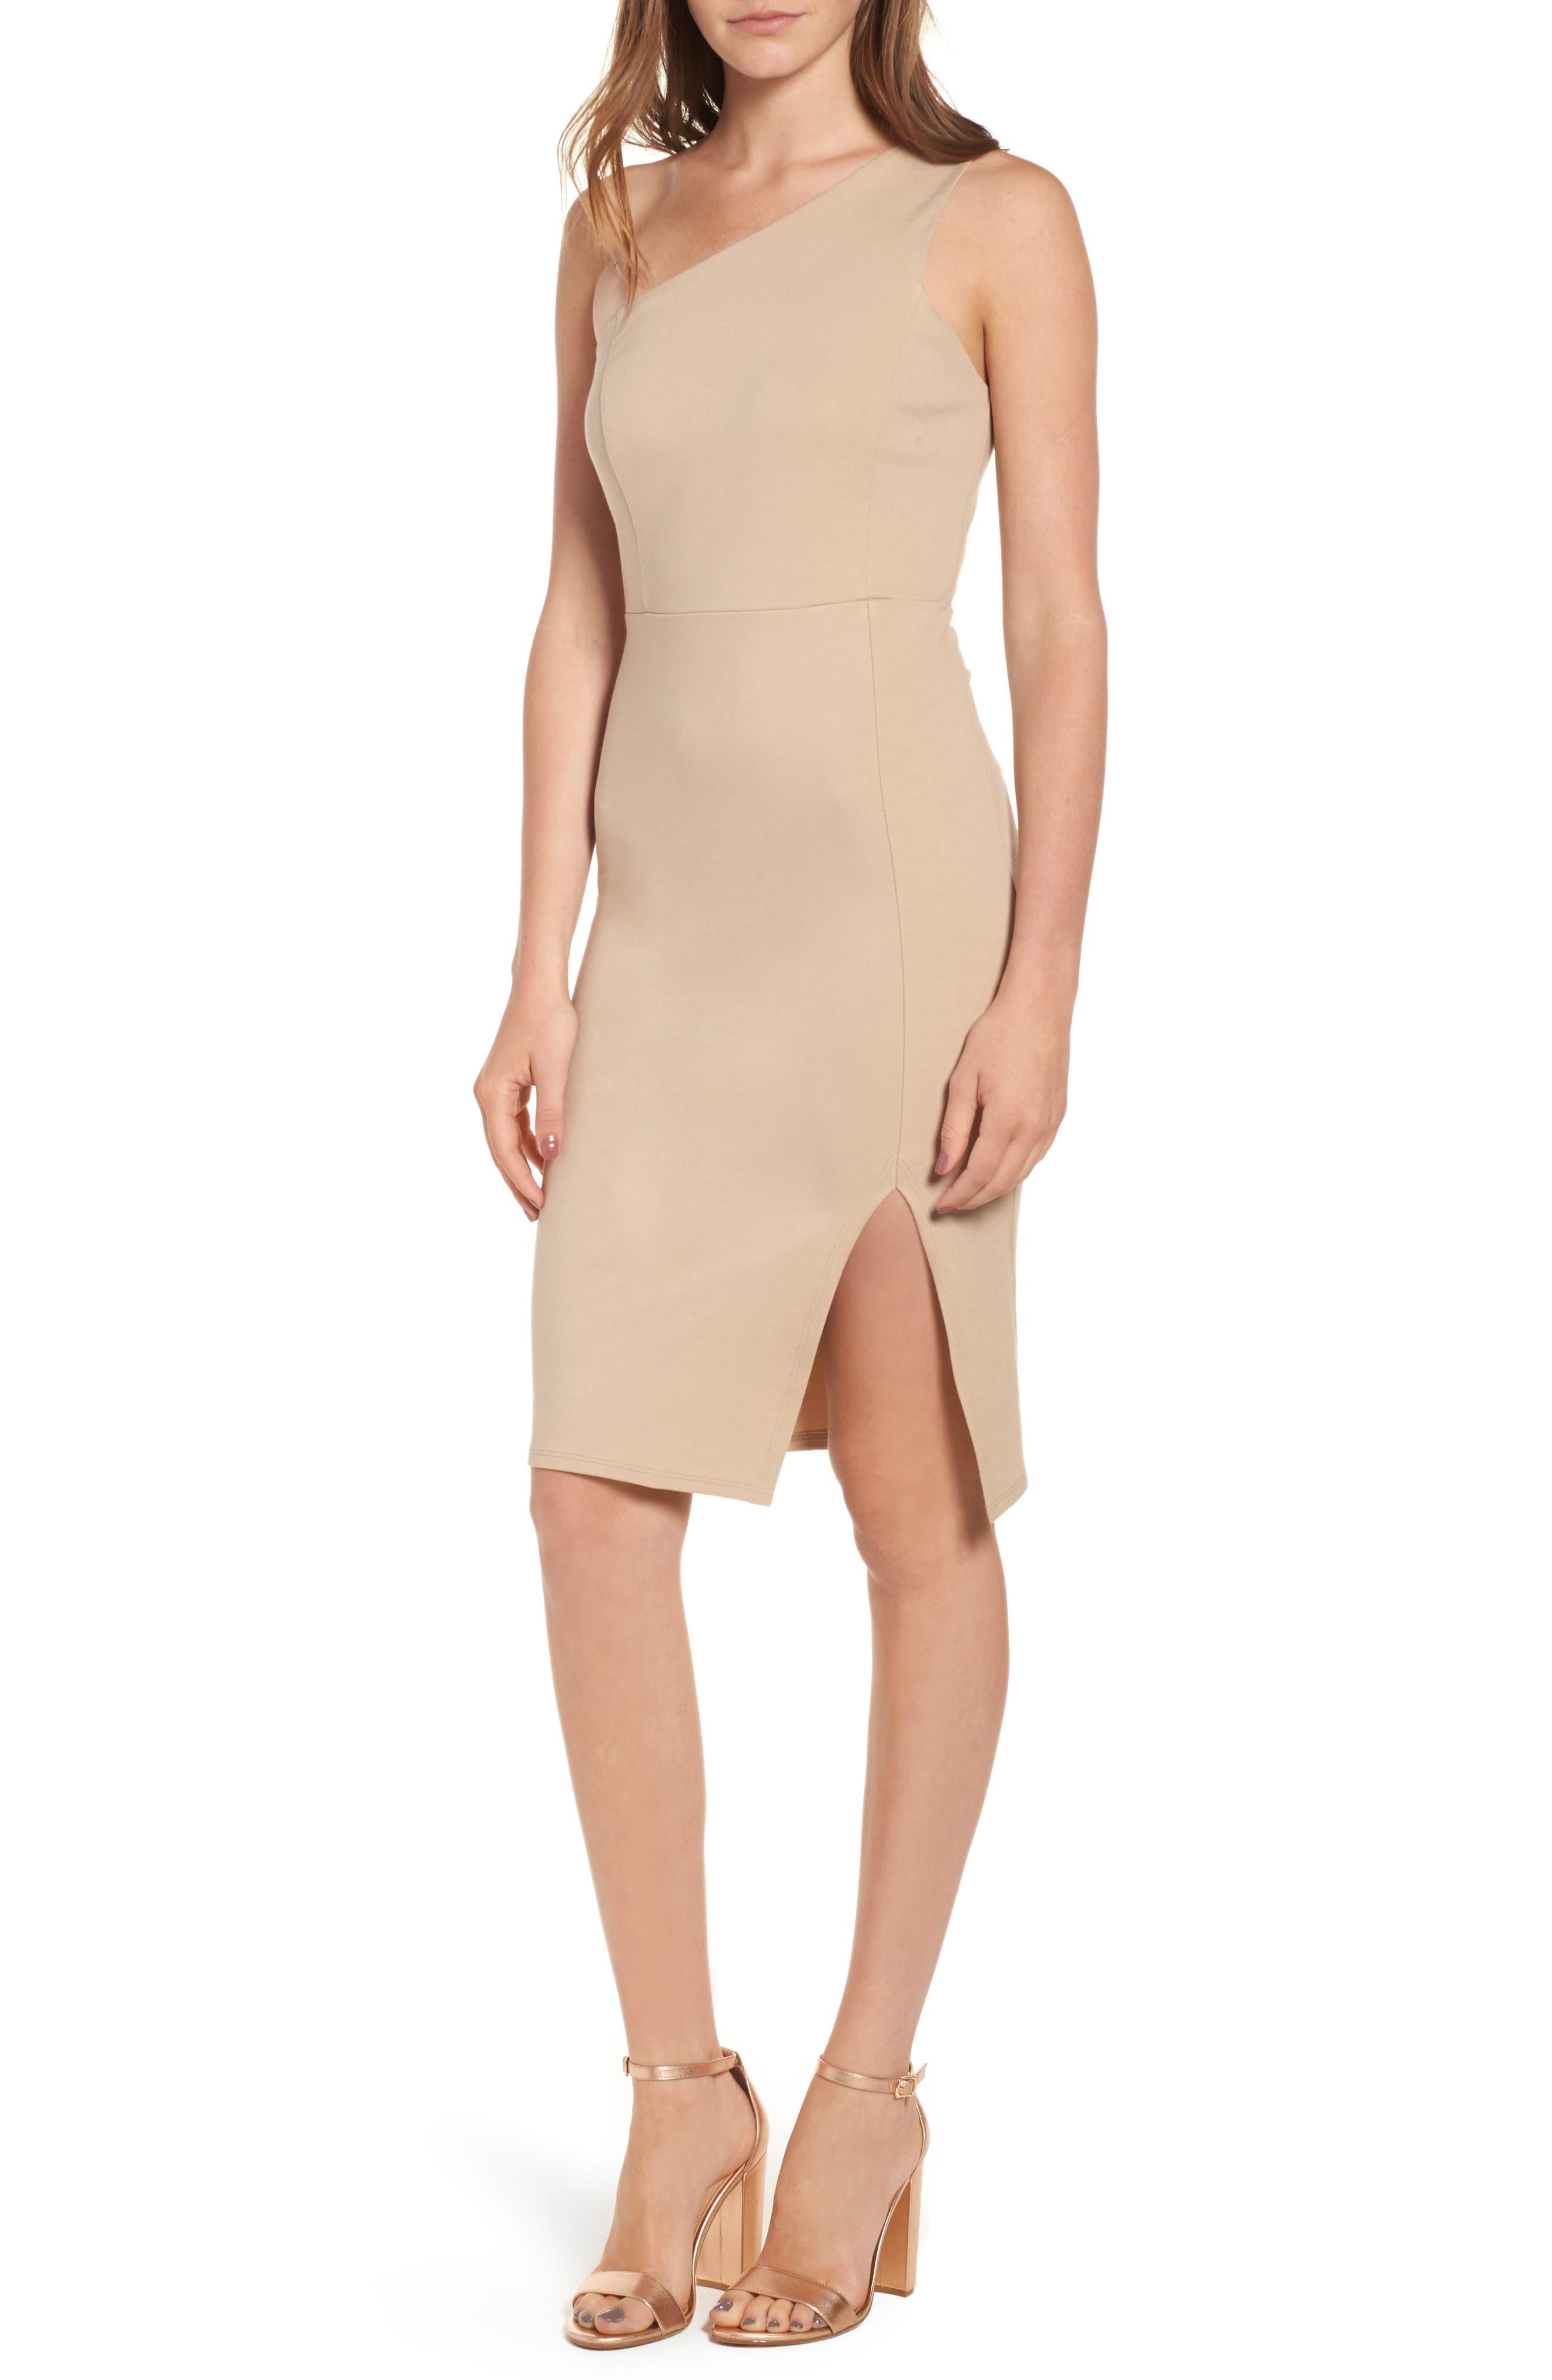 Soprano One-Shoulder Body-Con Dress